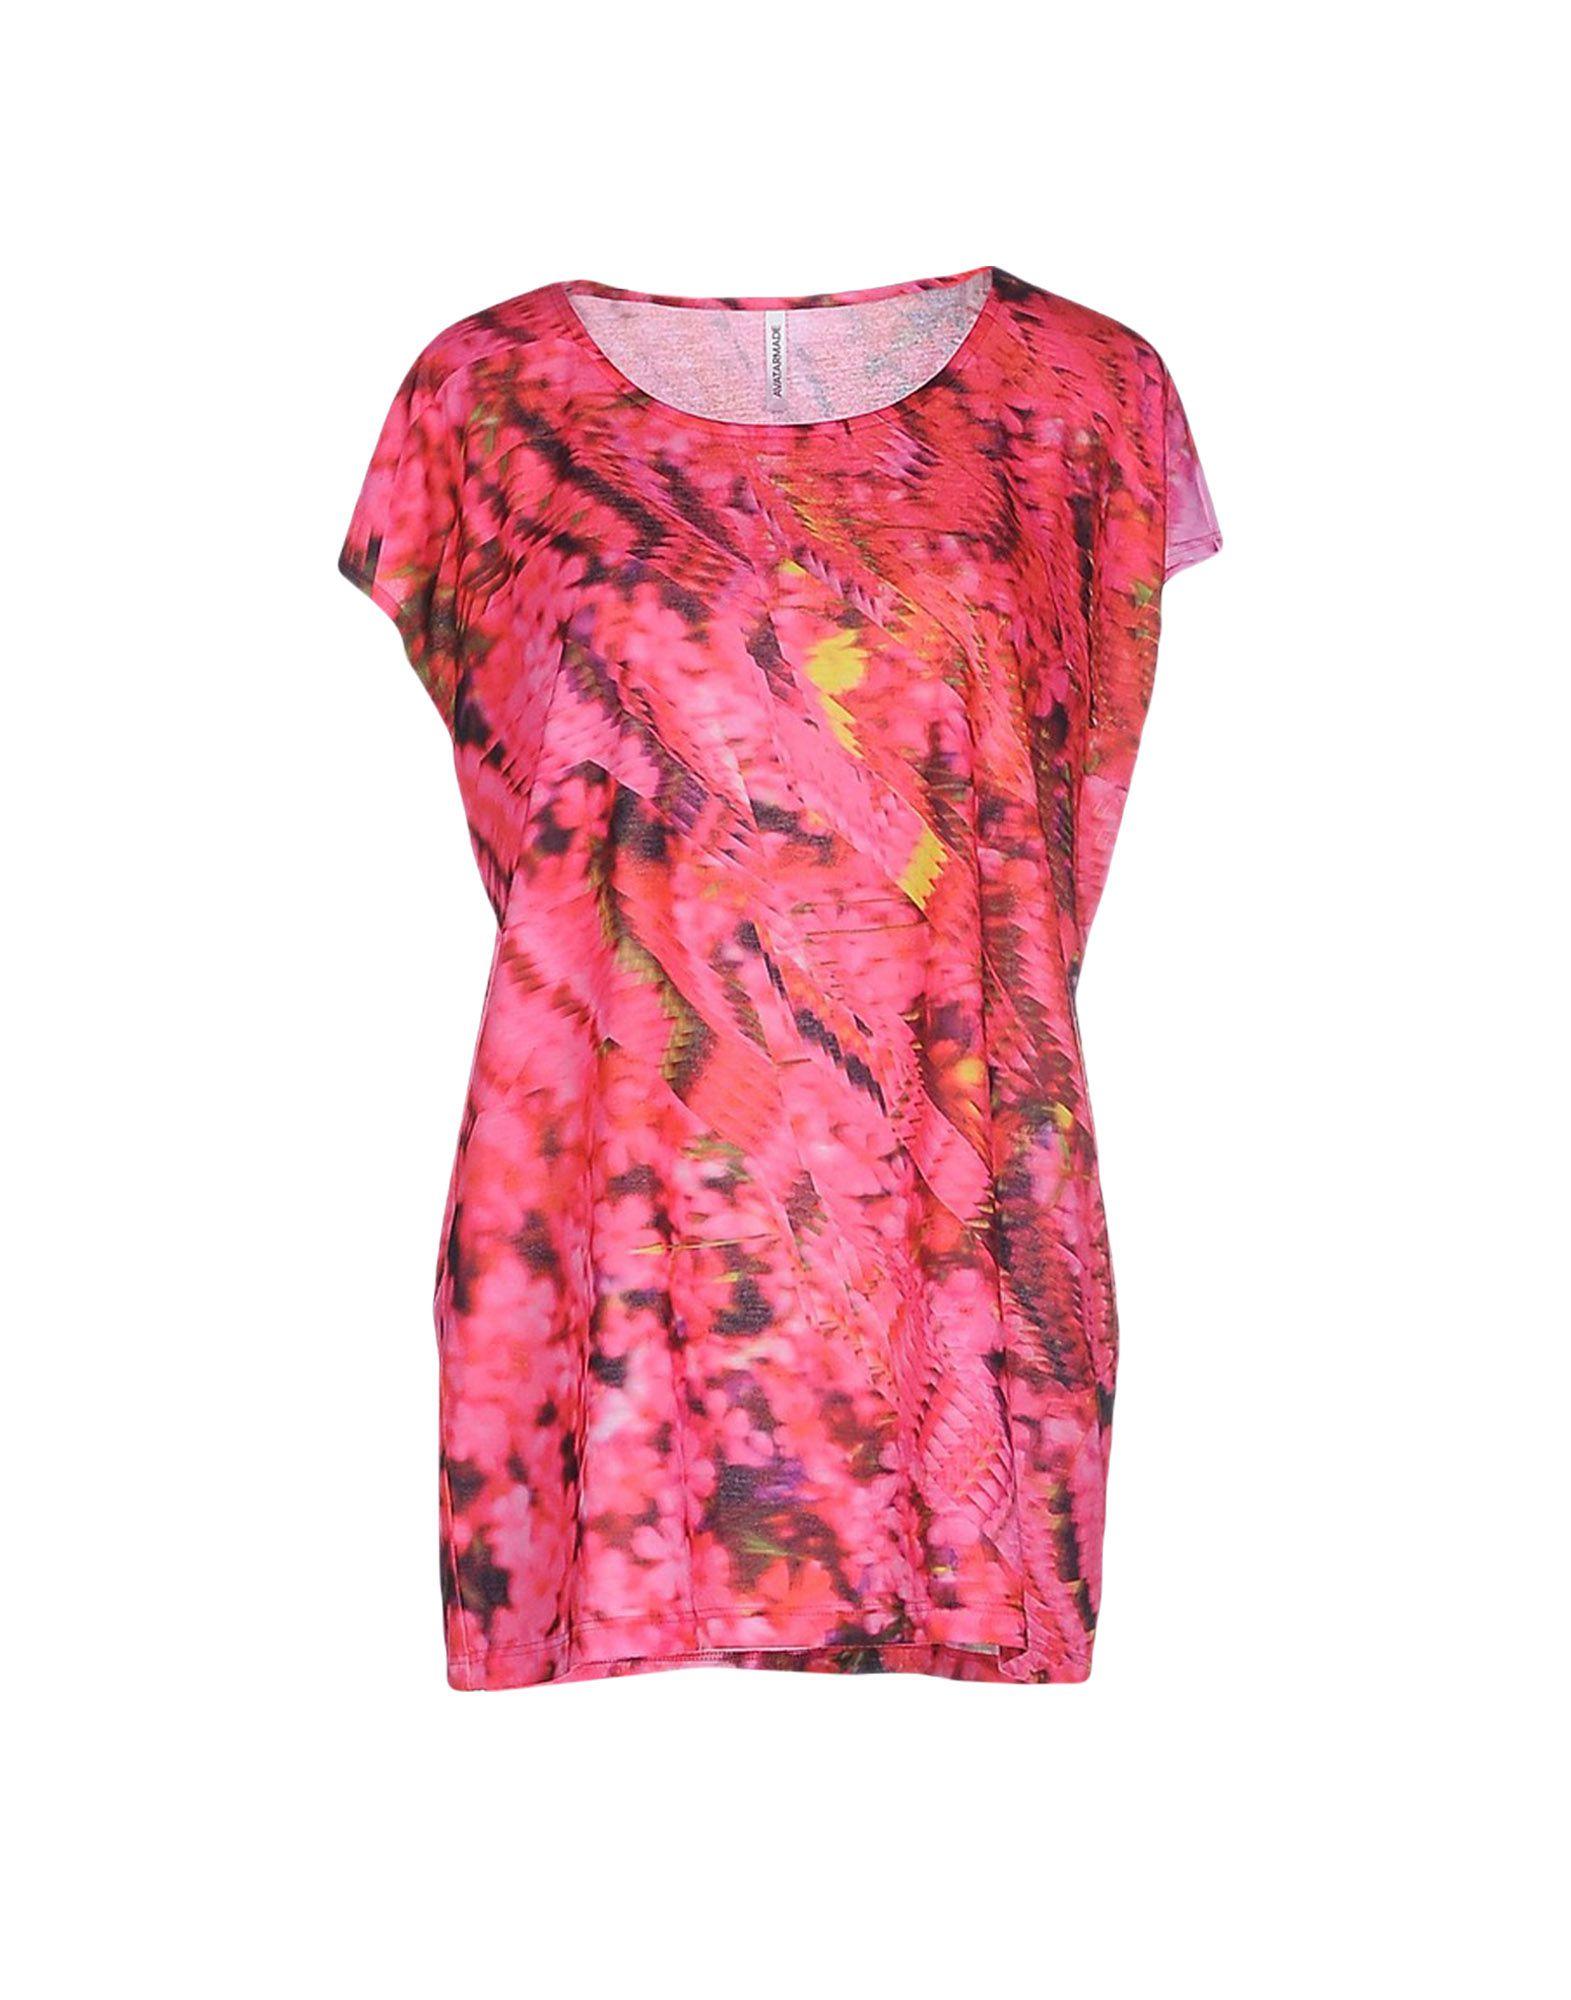 AVATARMADE T-shirts